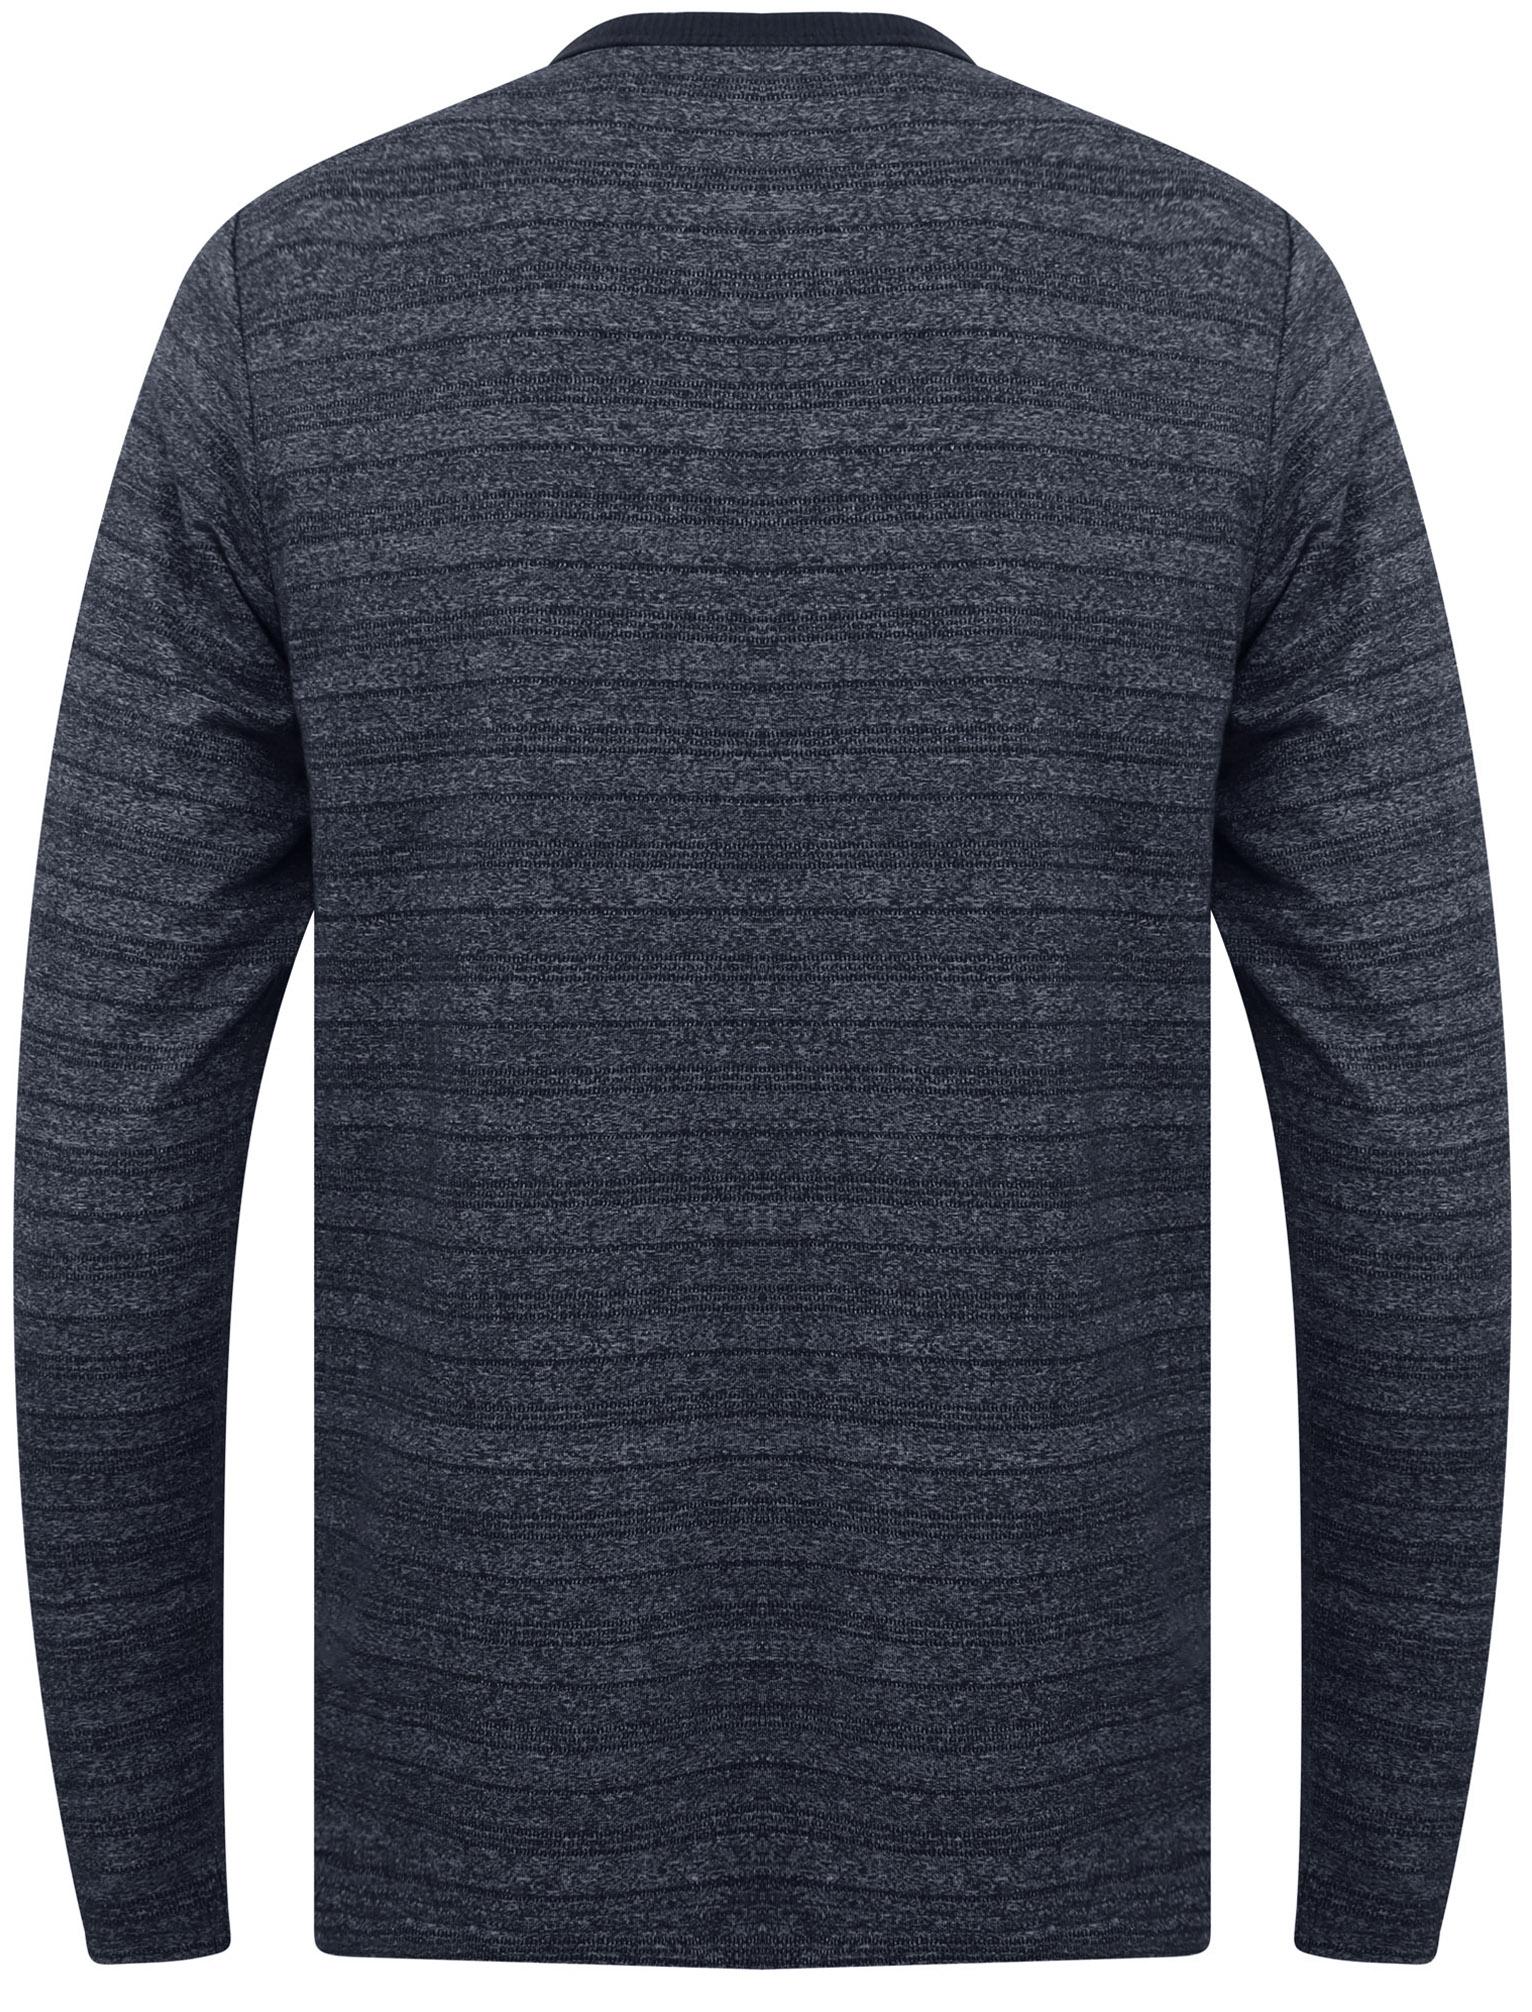 Tokyo-Laundry-Men-Hoaden-Crew-Neck-Long-Sleeve-T-Shirt-Top-Henley-Grandad-Collar thumbnail 3